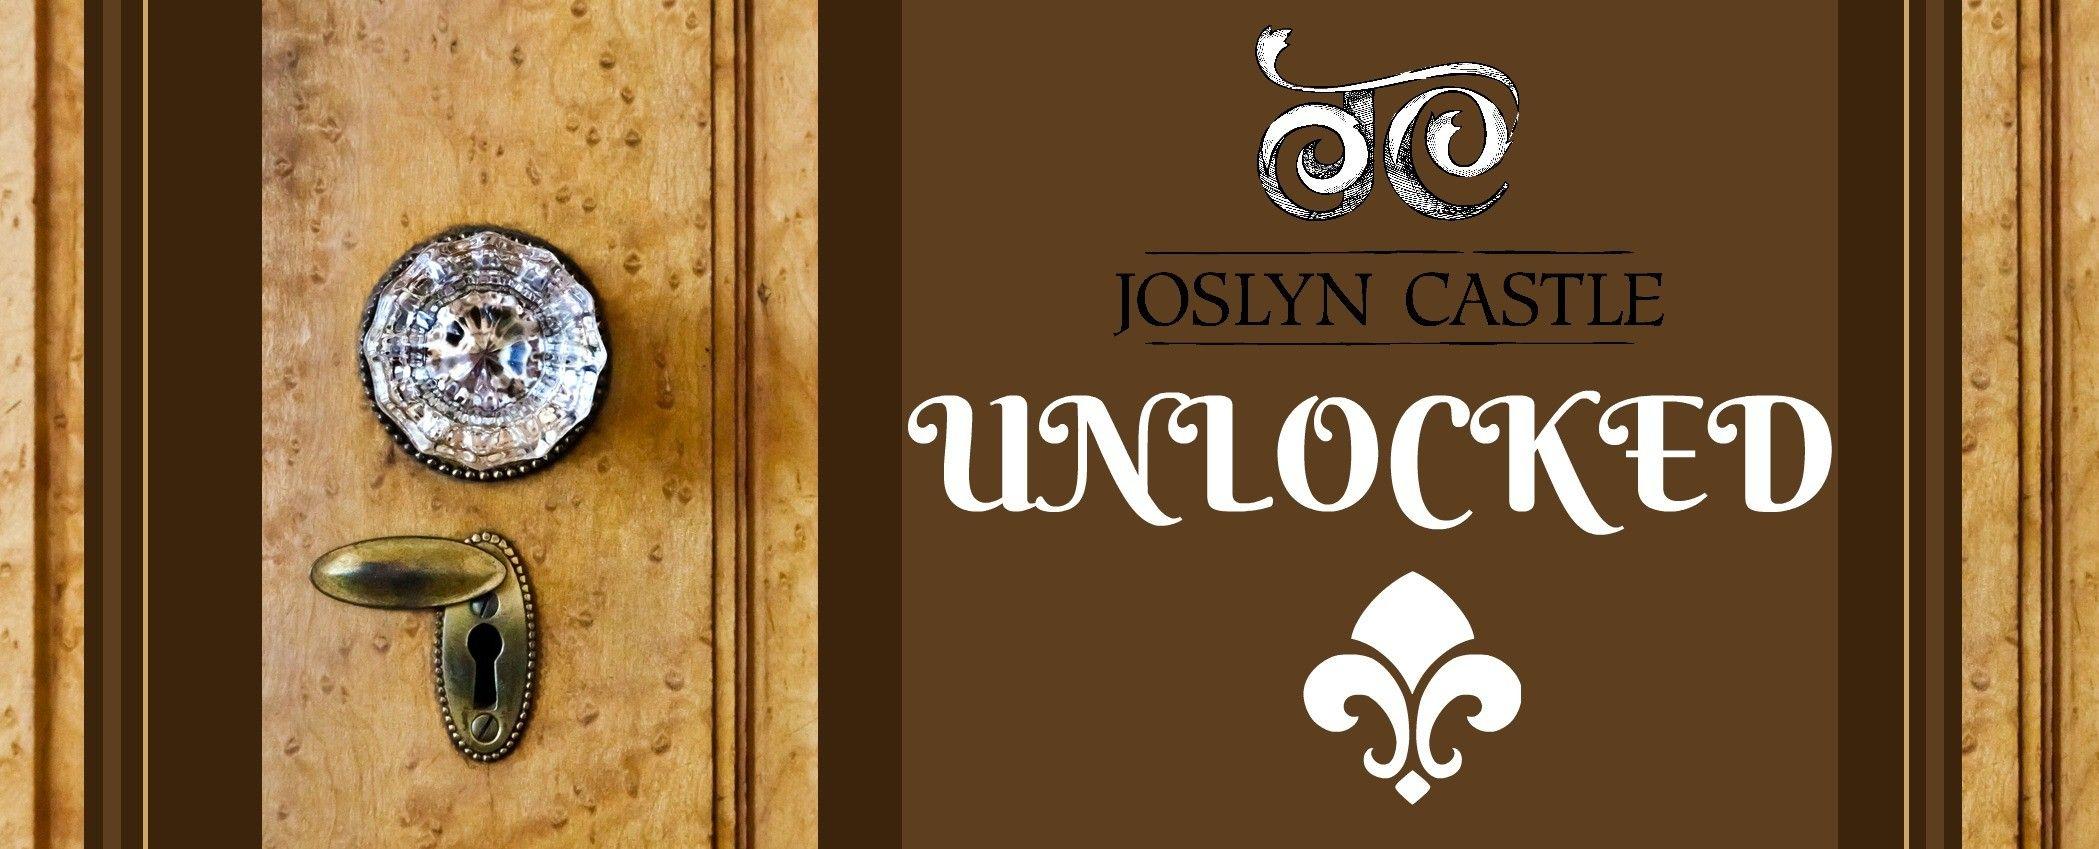 Joslyn Castle Unlocked: Holiday Edition